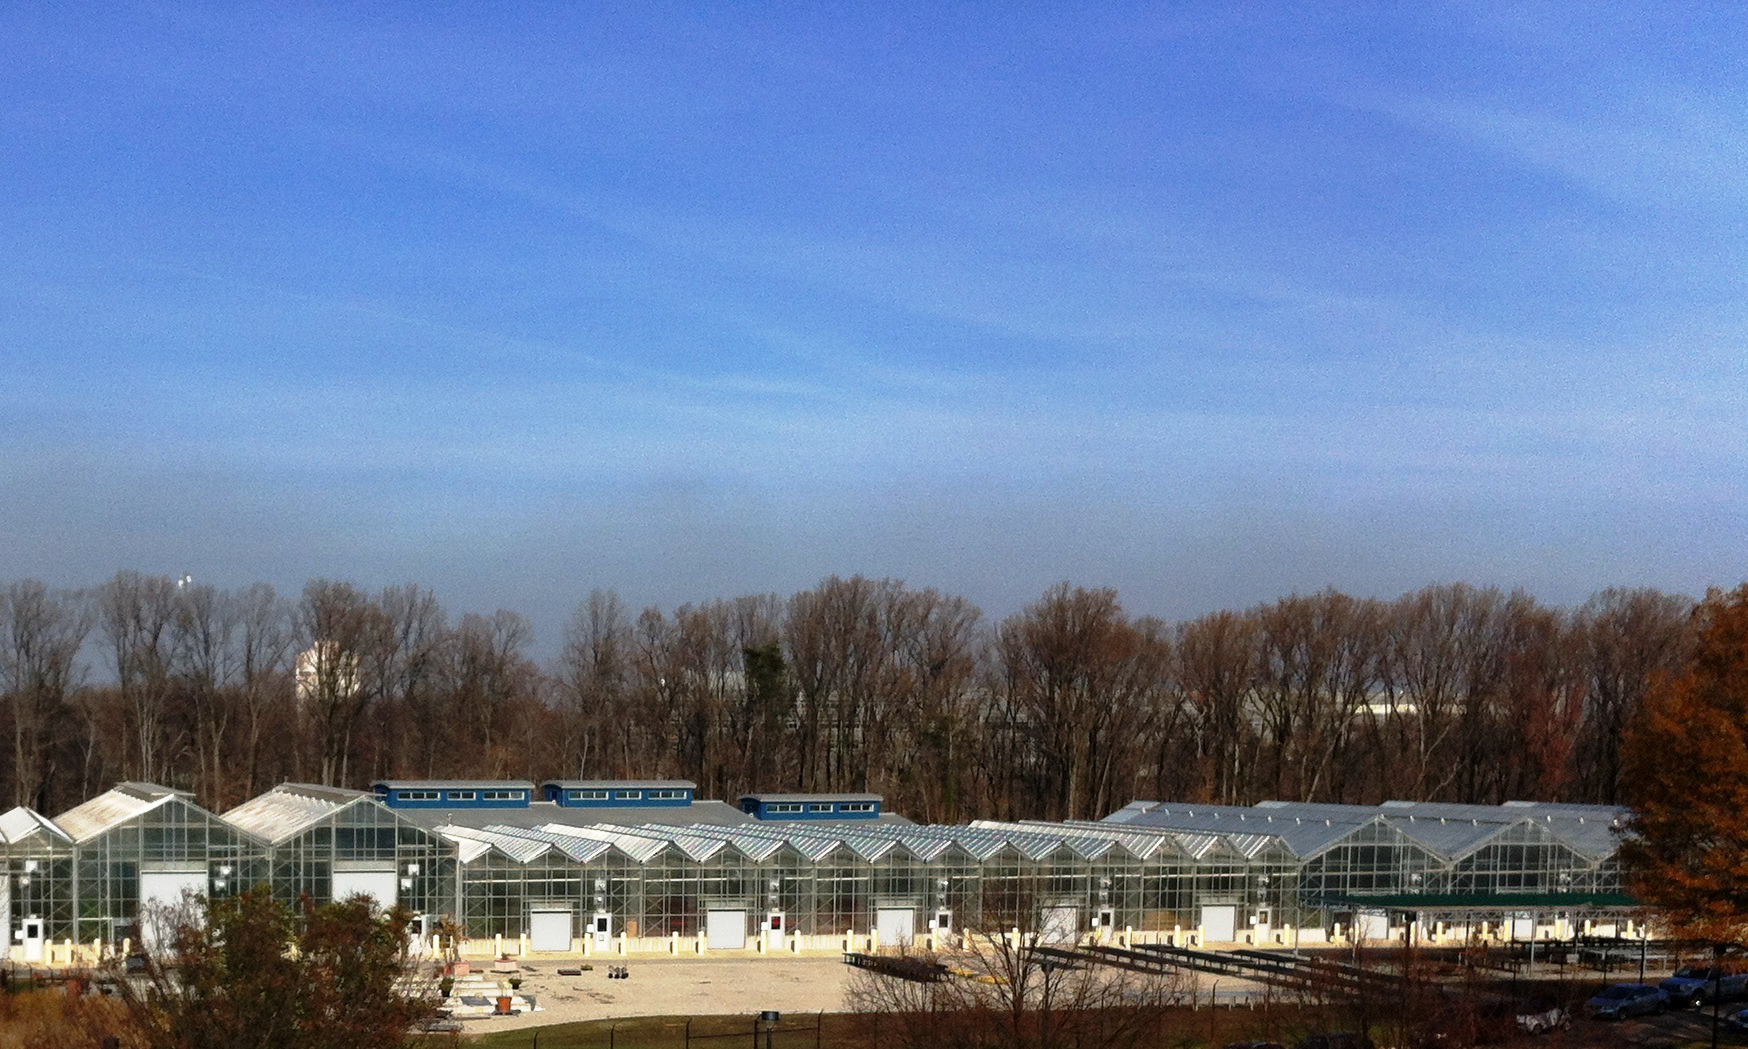 greenhousesFrMSCroof_151210.1brighter_aspectRatio.jpg